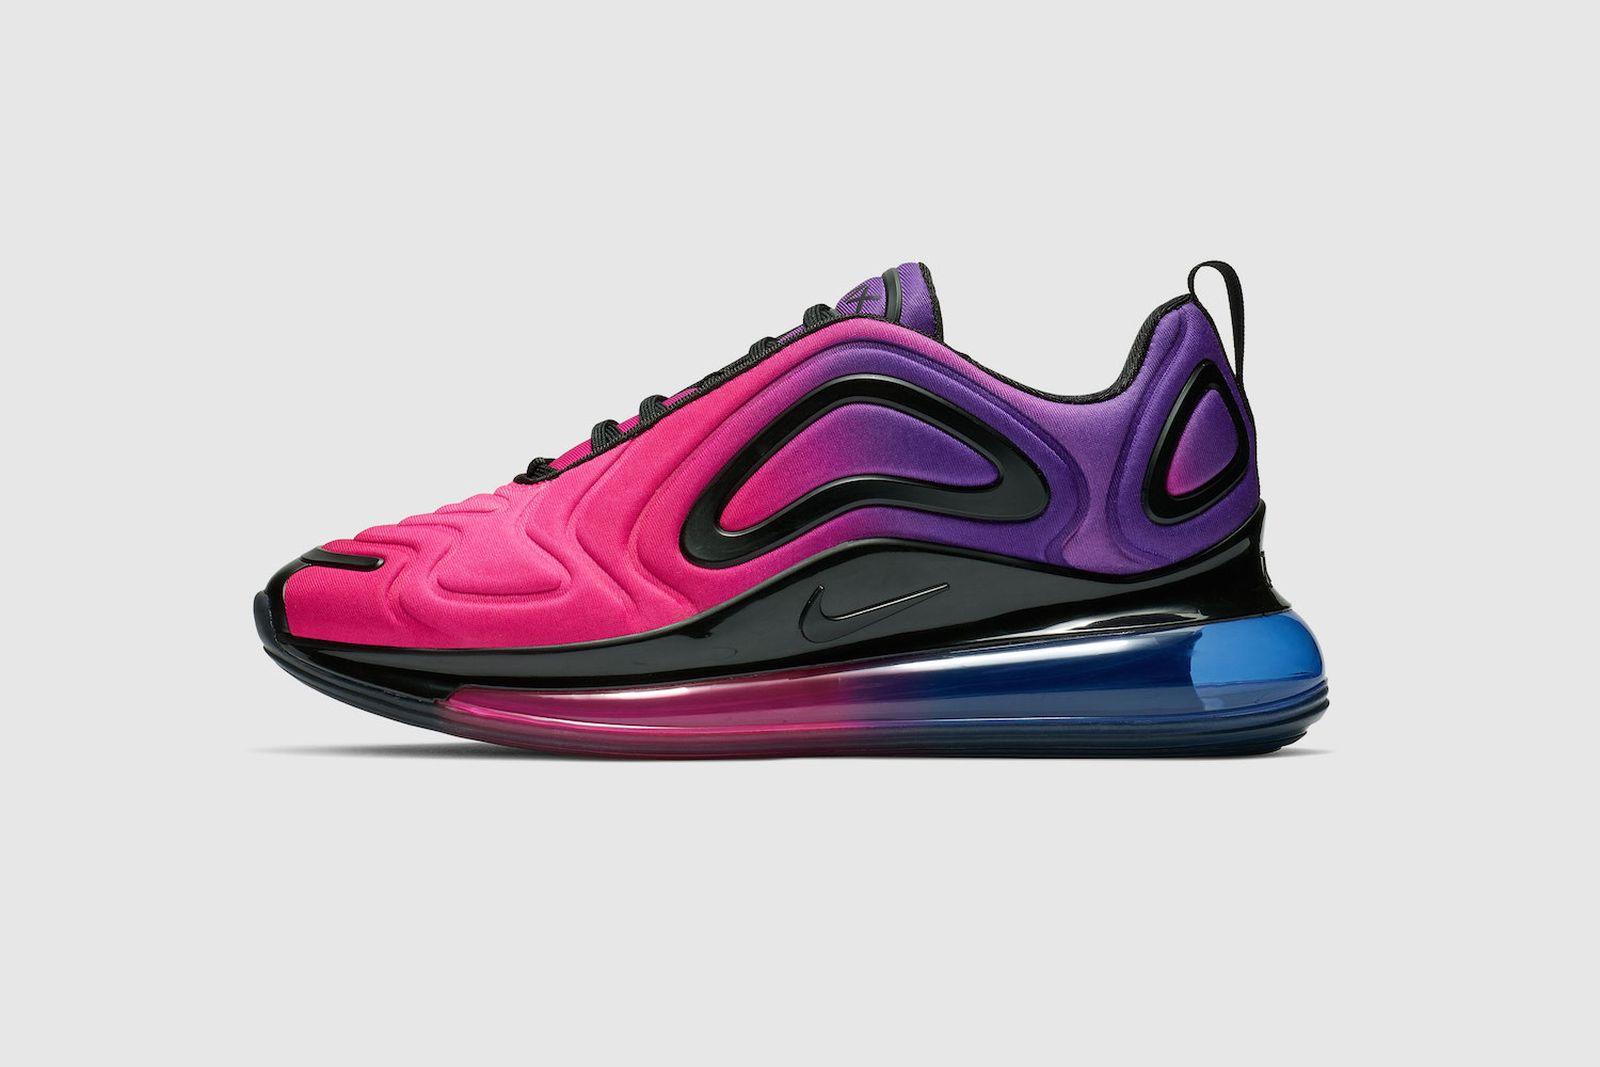 nike air max 720 2019 colorways release date price NikePlus